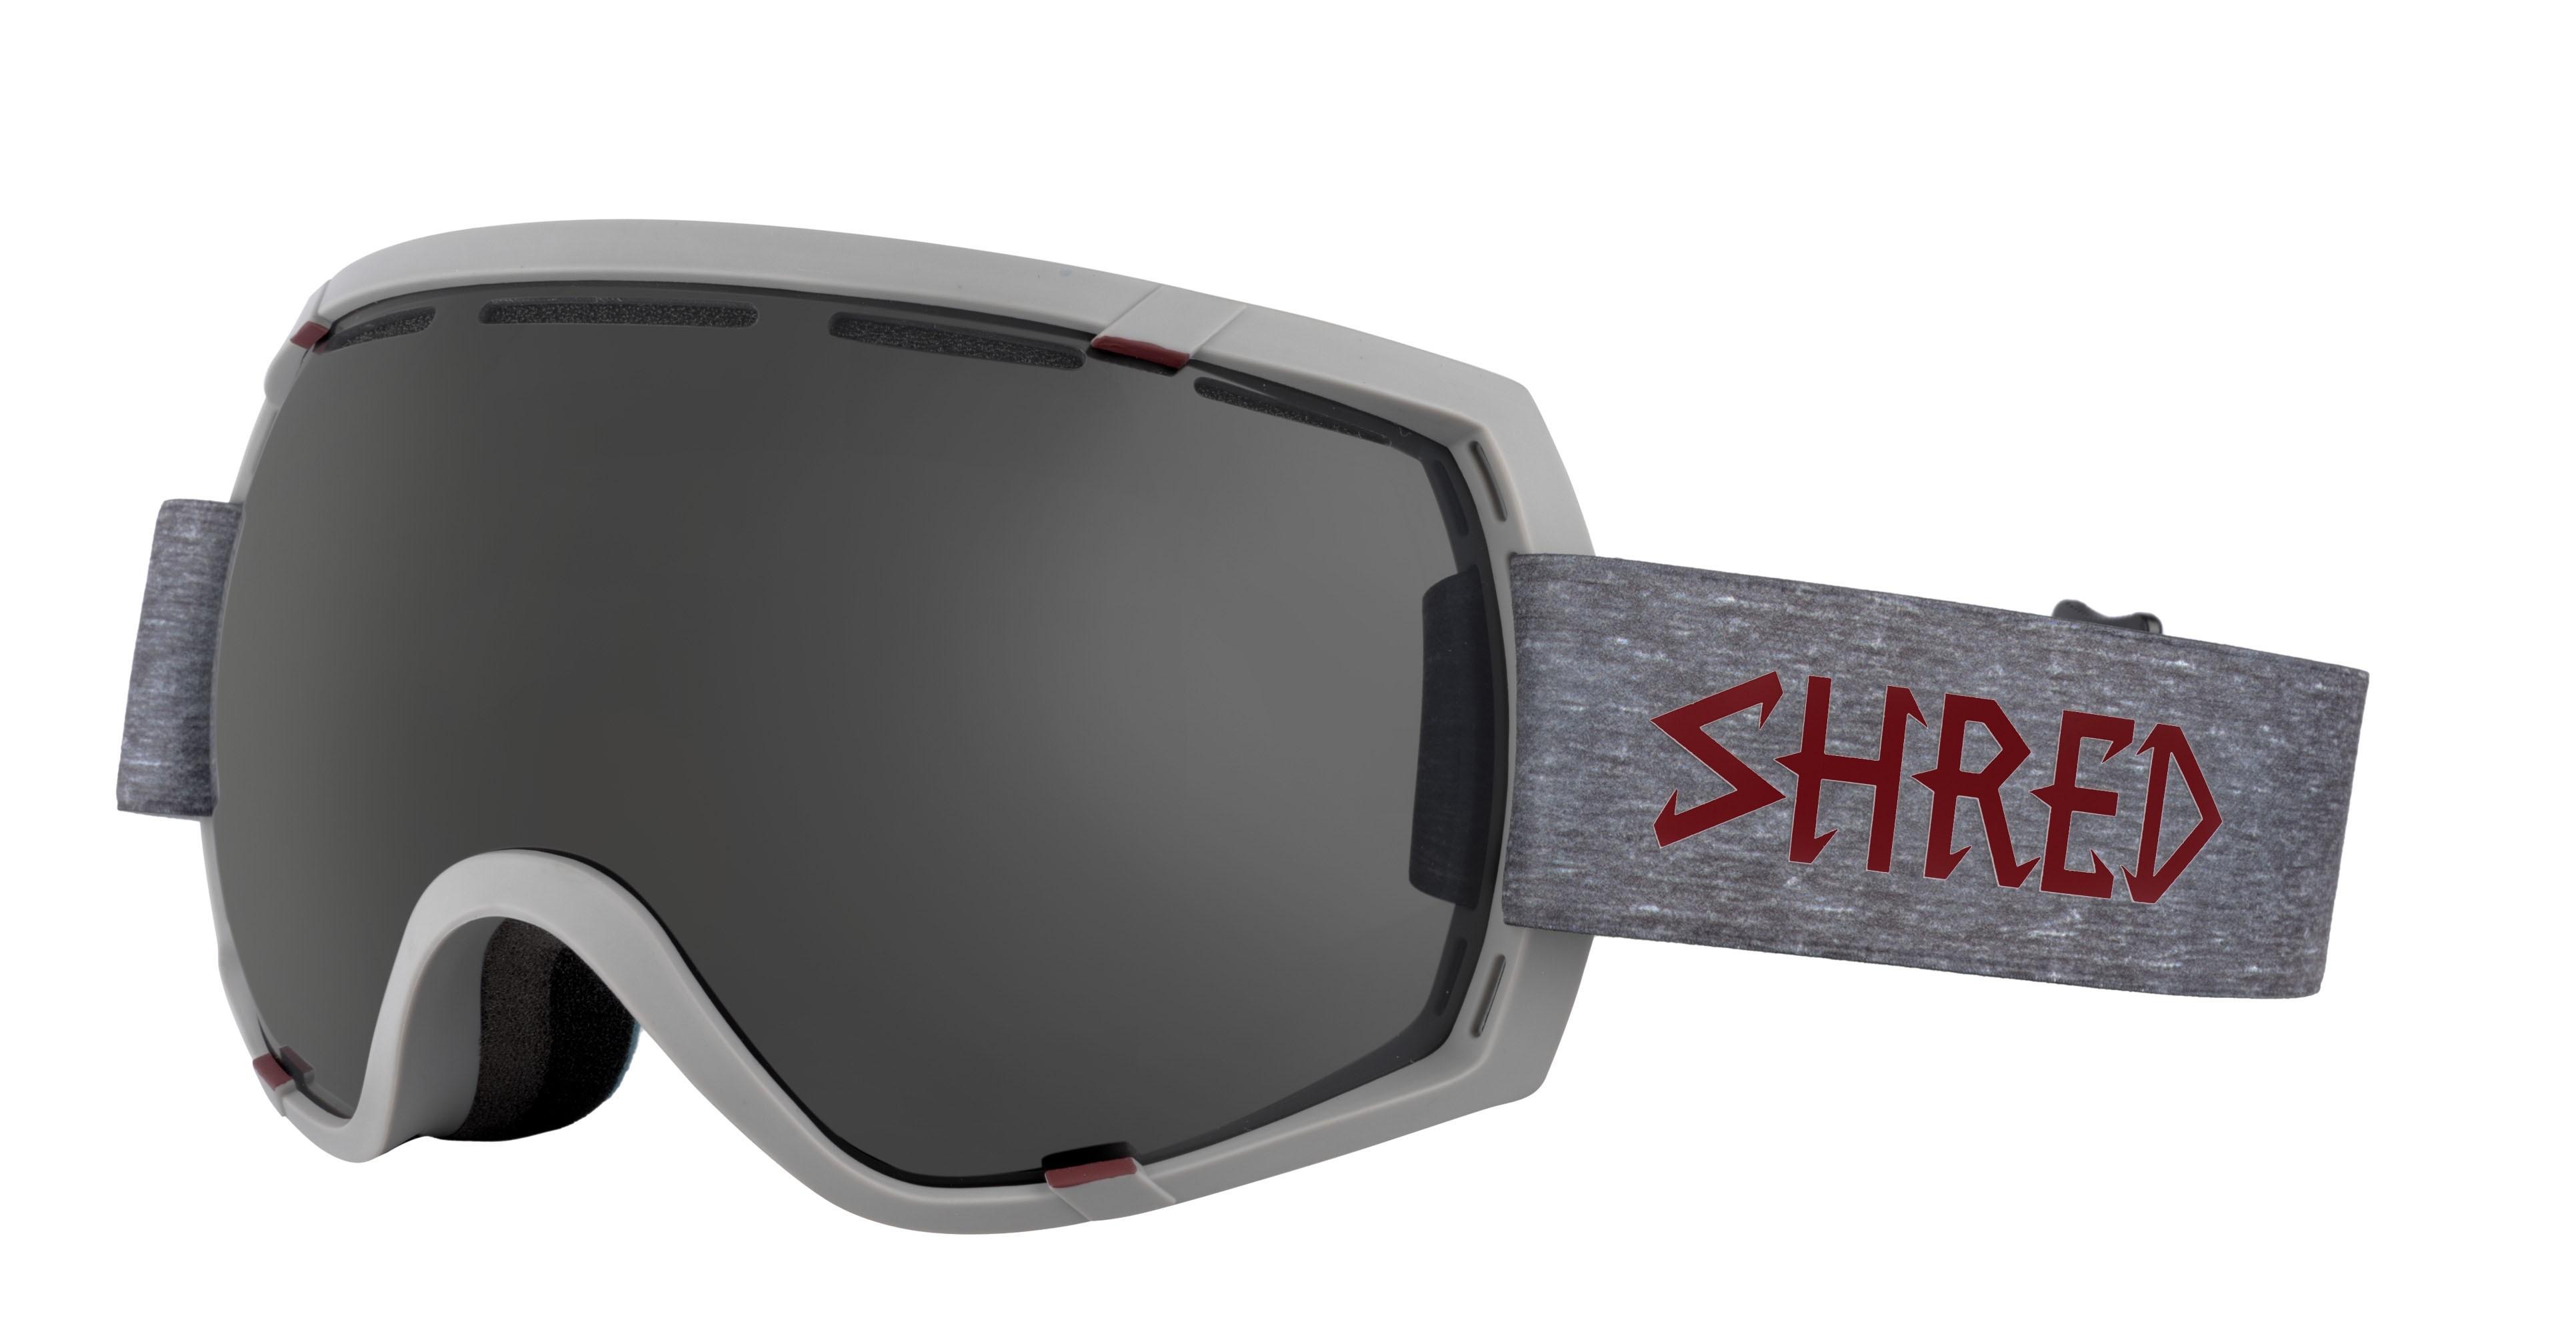 Shred Stupefy Heather goggles, 2018